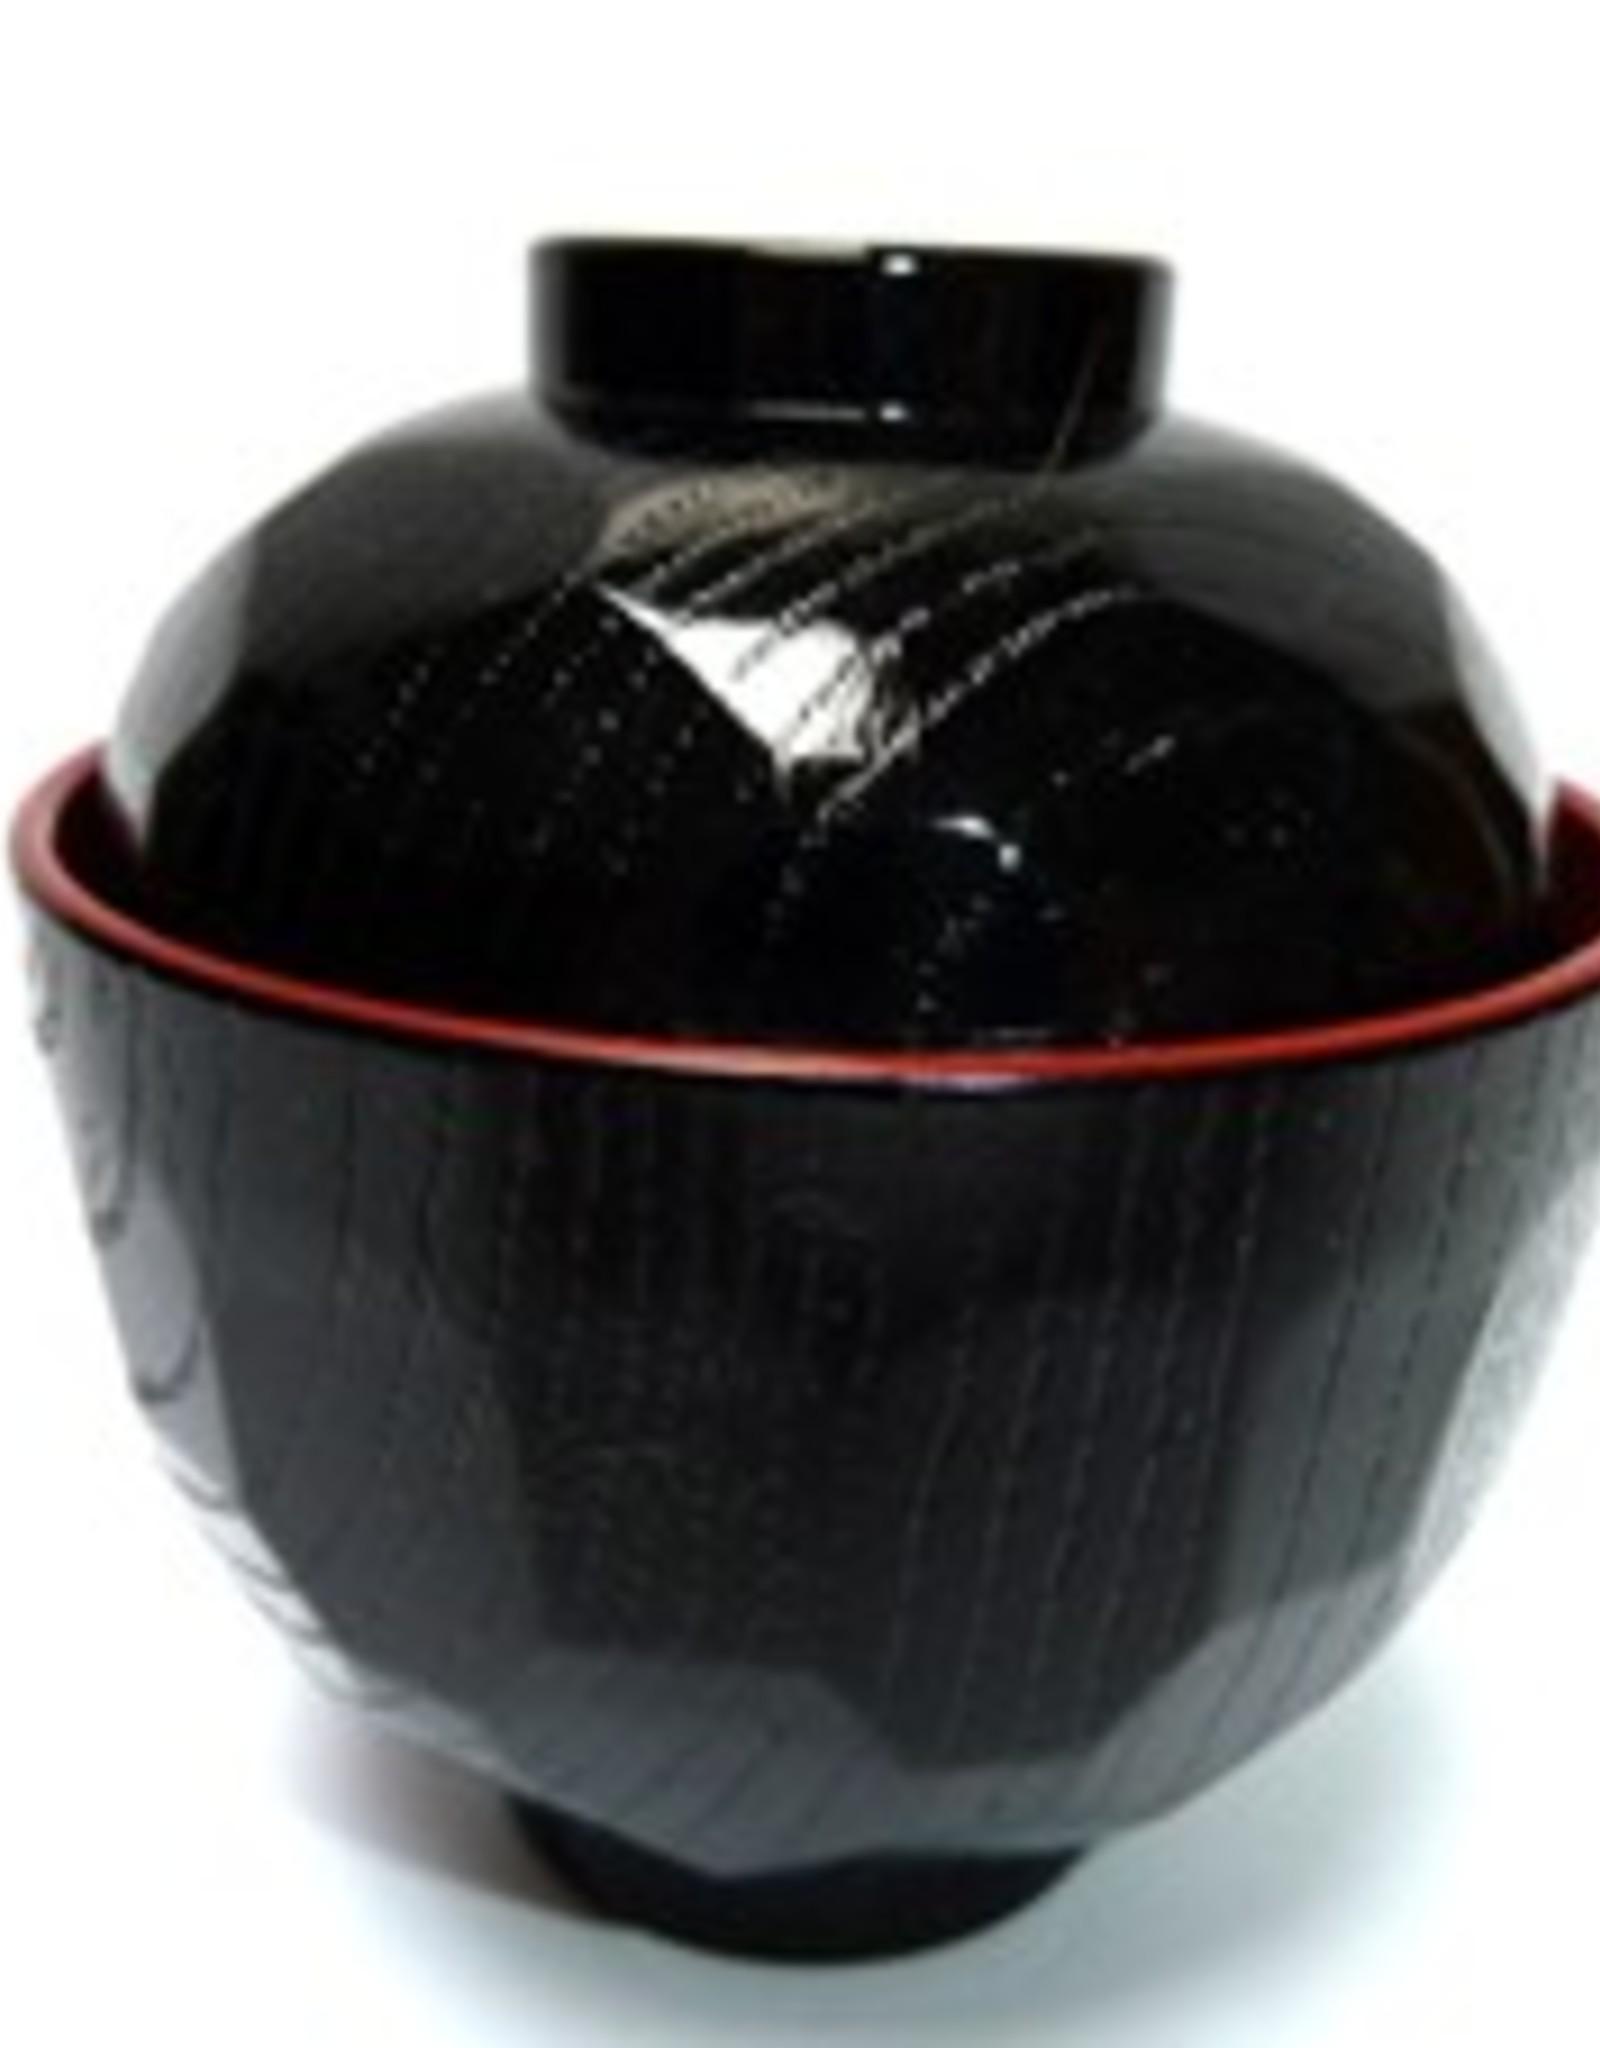 Tokyo Design Studio Miso soup bowl small black red